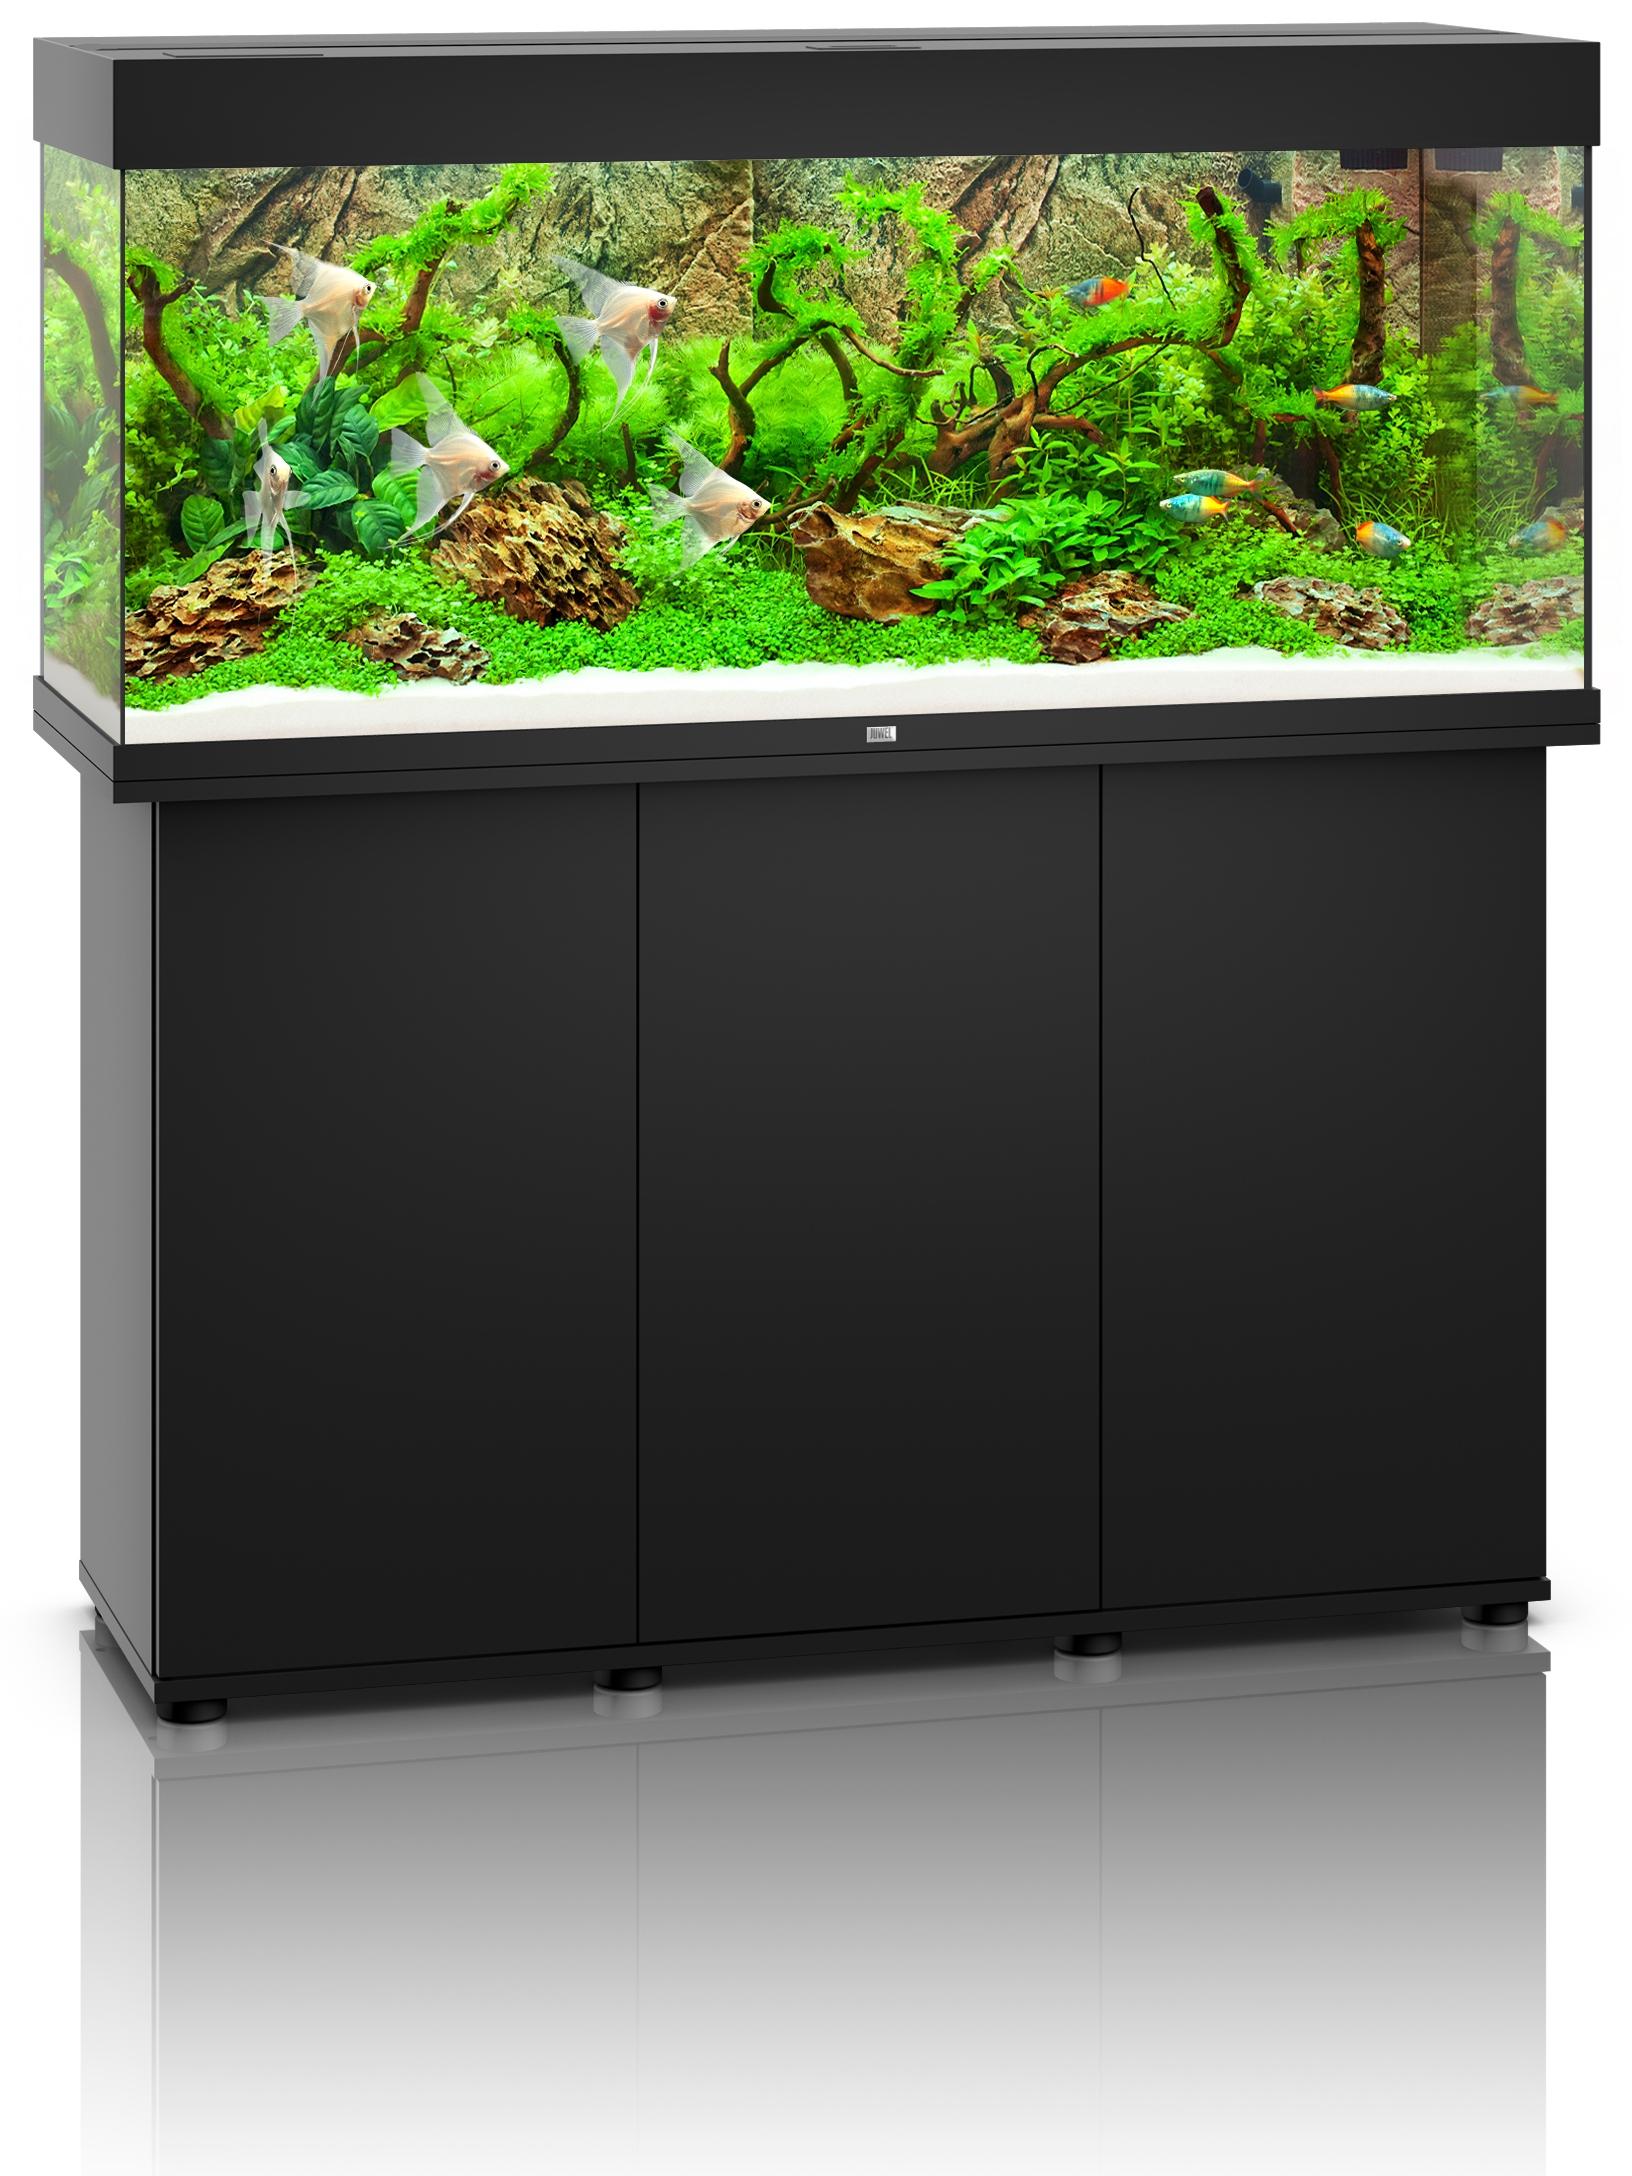 juwel rio 240 led kombination mit unterschrank portofrei. Black Bedroom Furniture Sets. Home Design Ideas